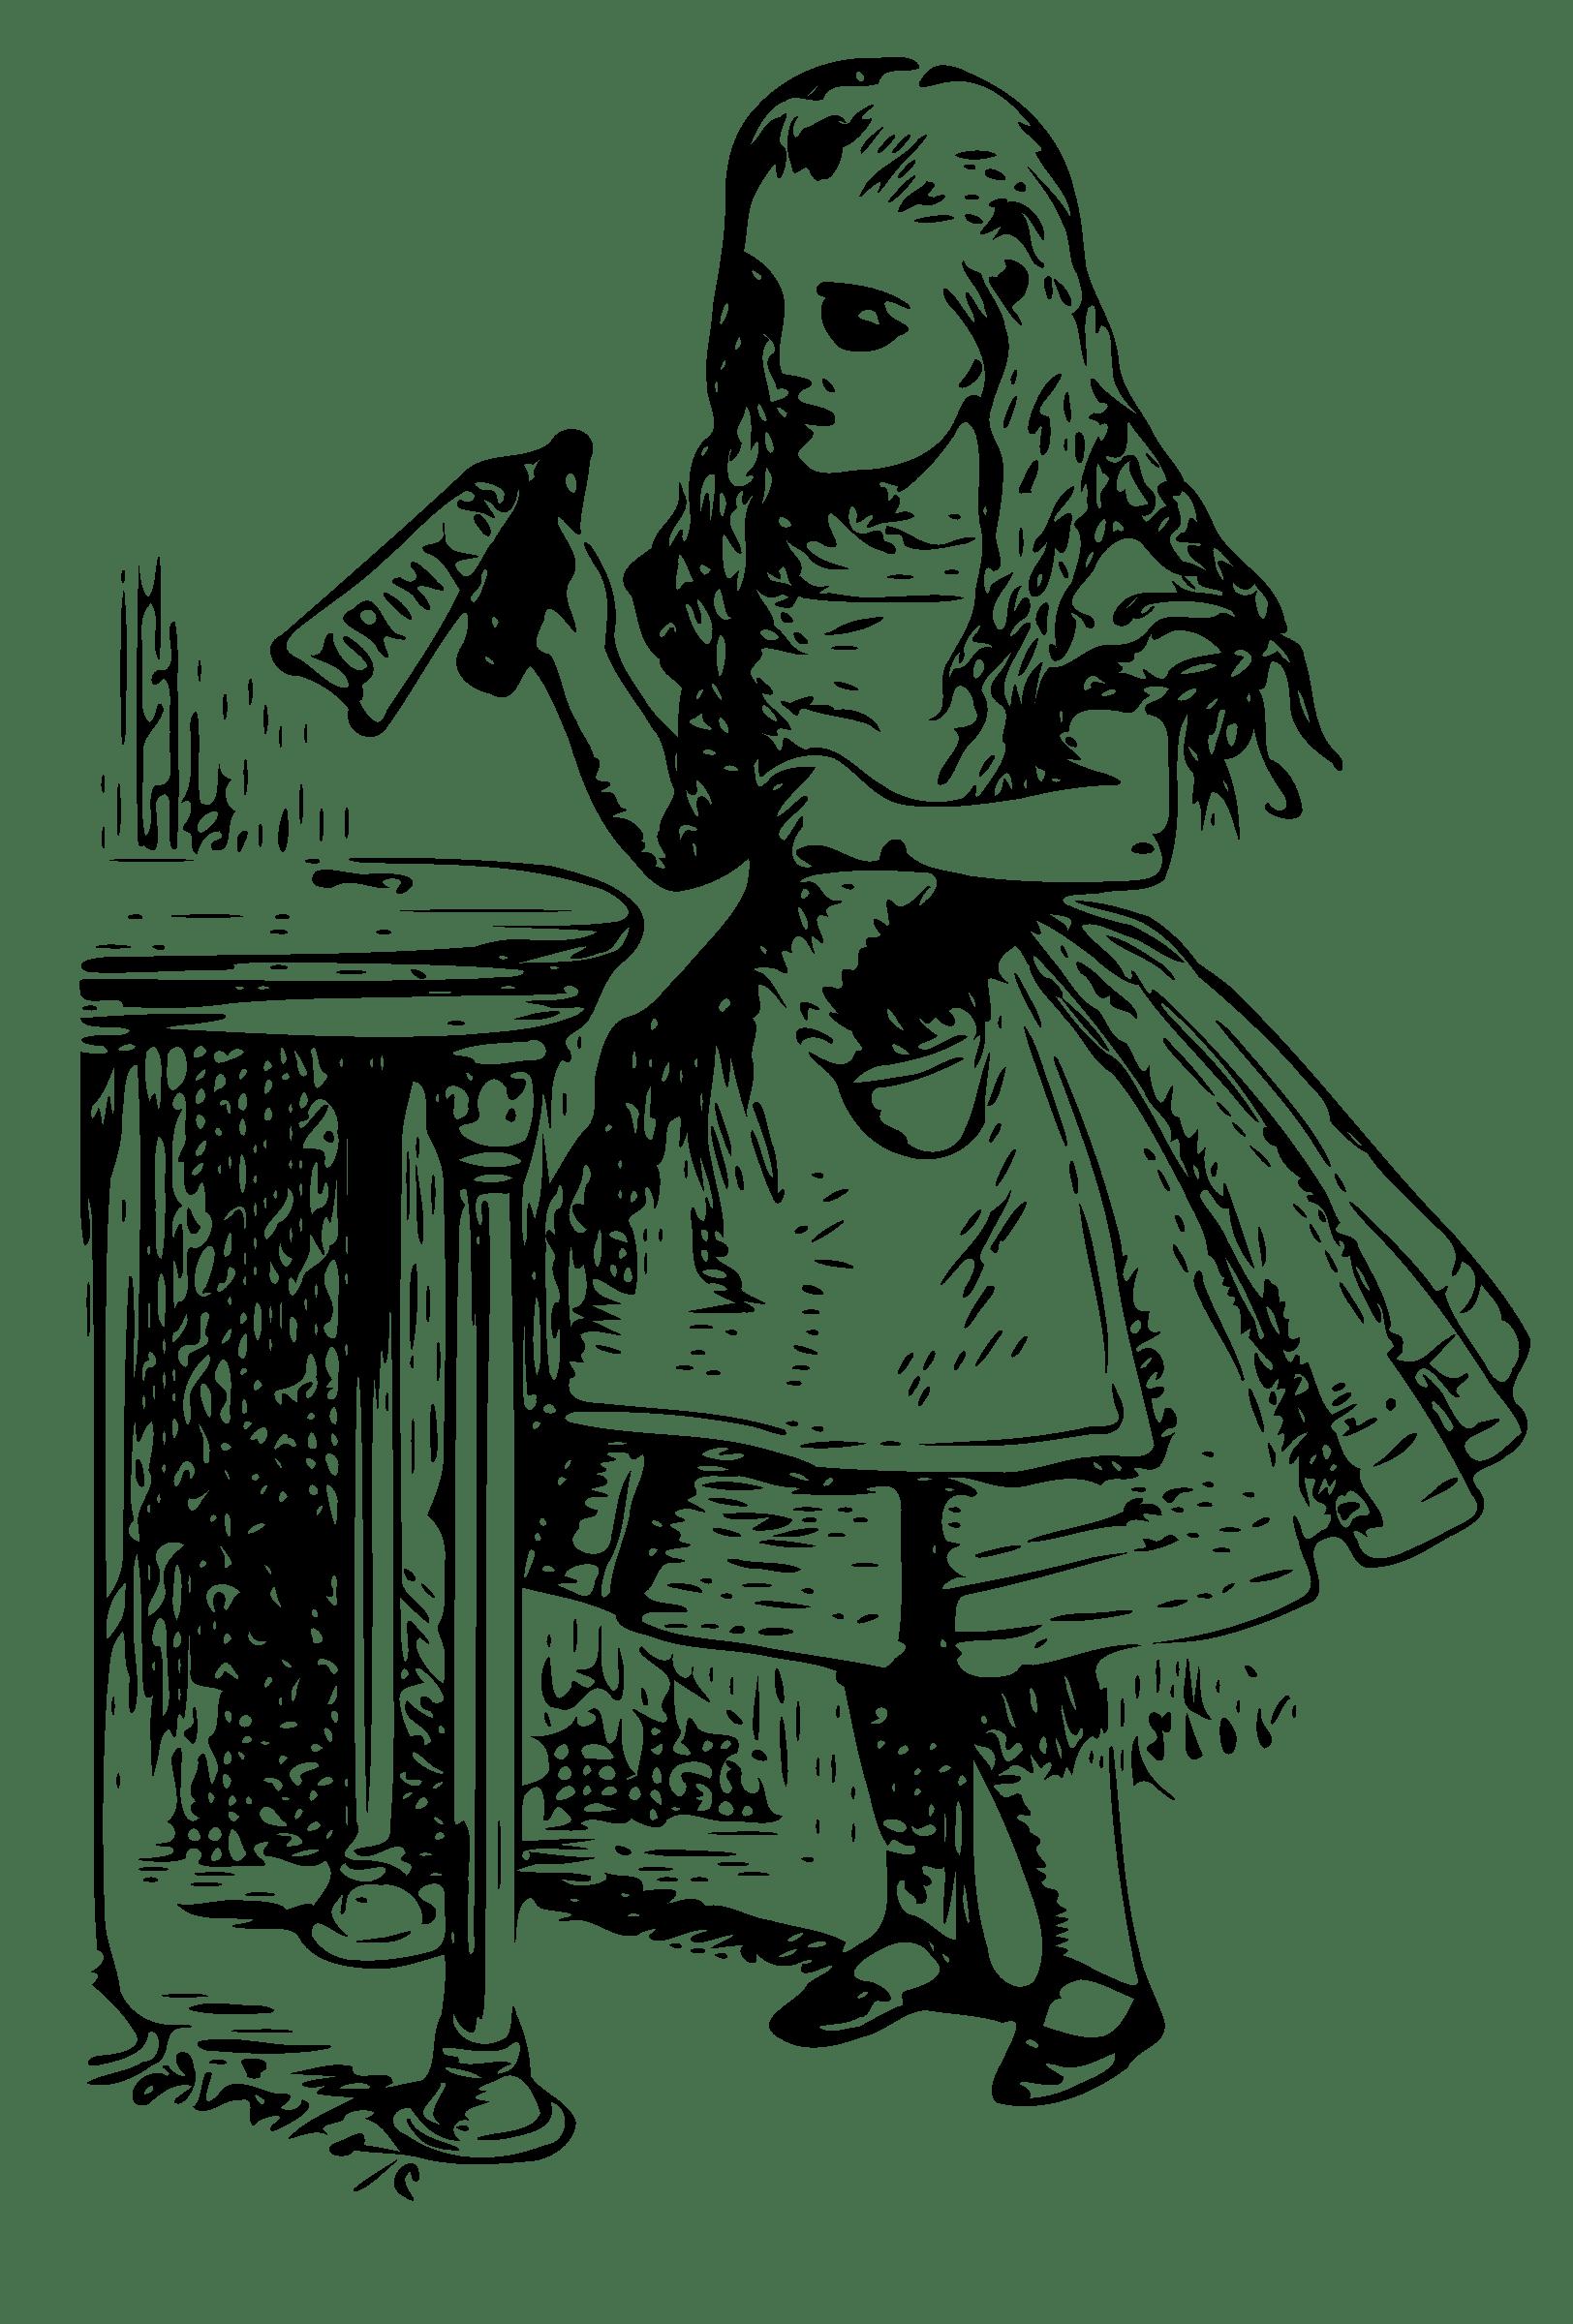 Alice in wonderland book clipart graphic library library Alice In Wonderland Vintage transparent PNG - StickPNG graphic library library